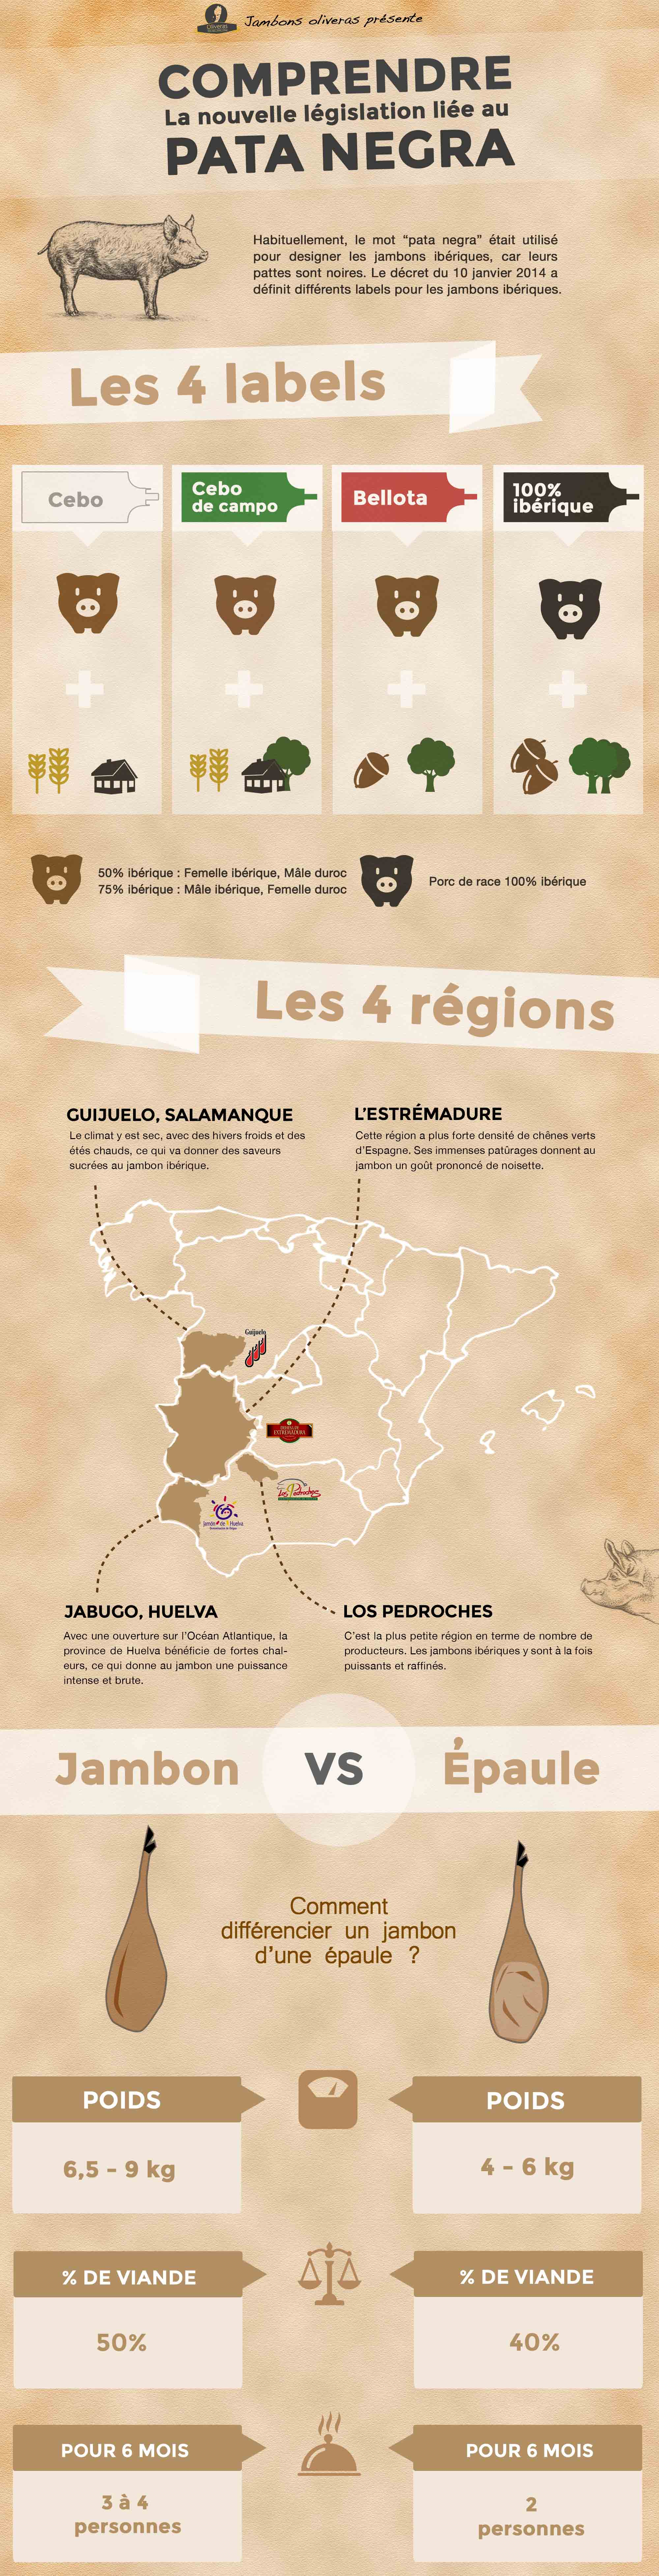 infographie_pata_negra_Jambons_Oliveras